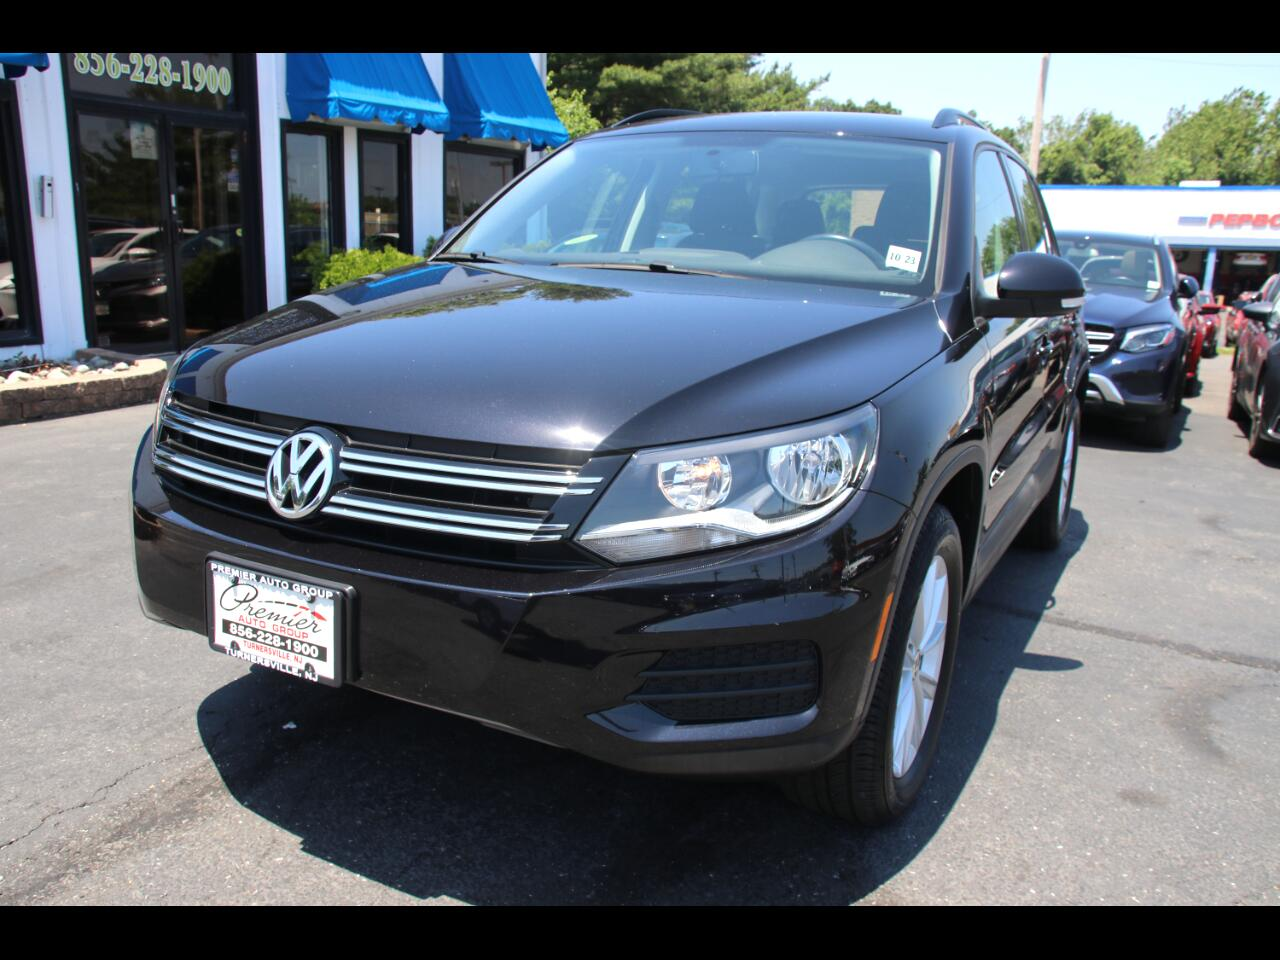 Volkswagen Tiguan Limited 2.0T 4MOTION 2018